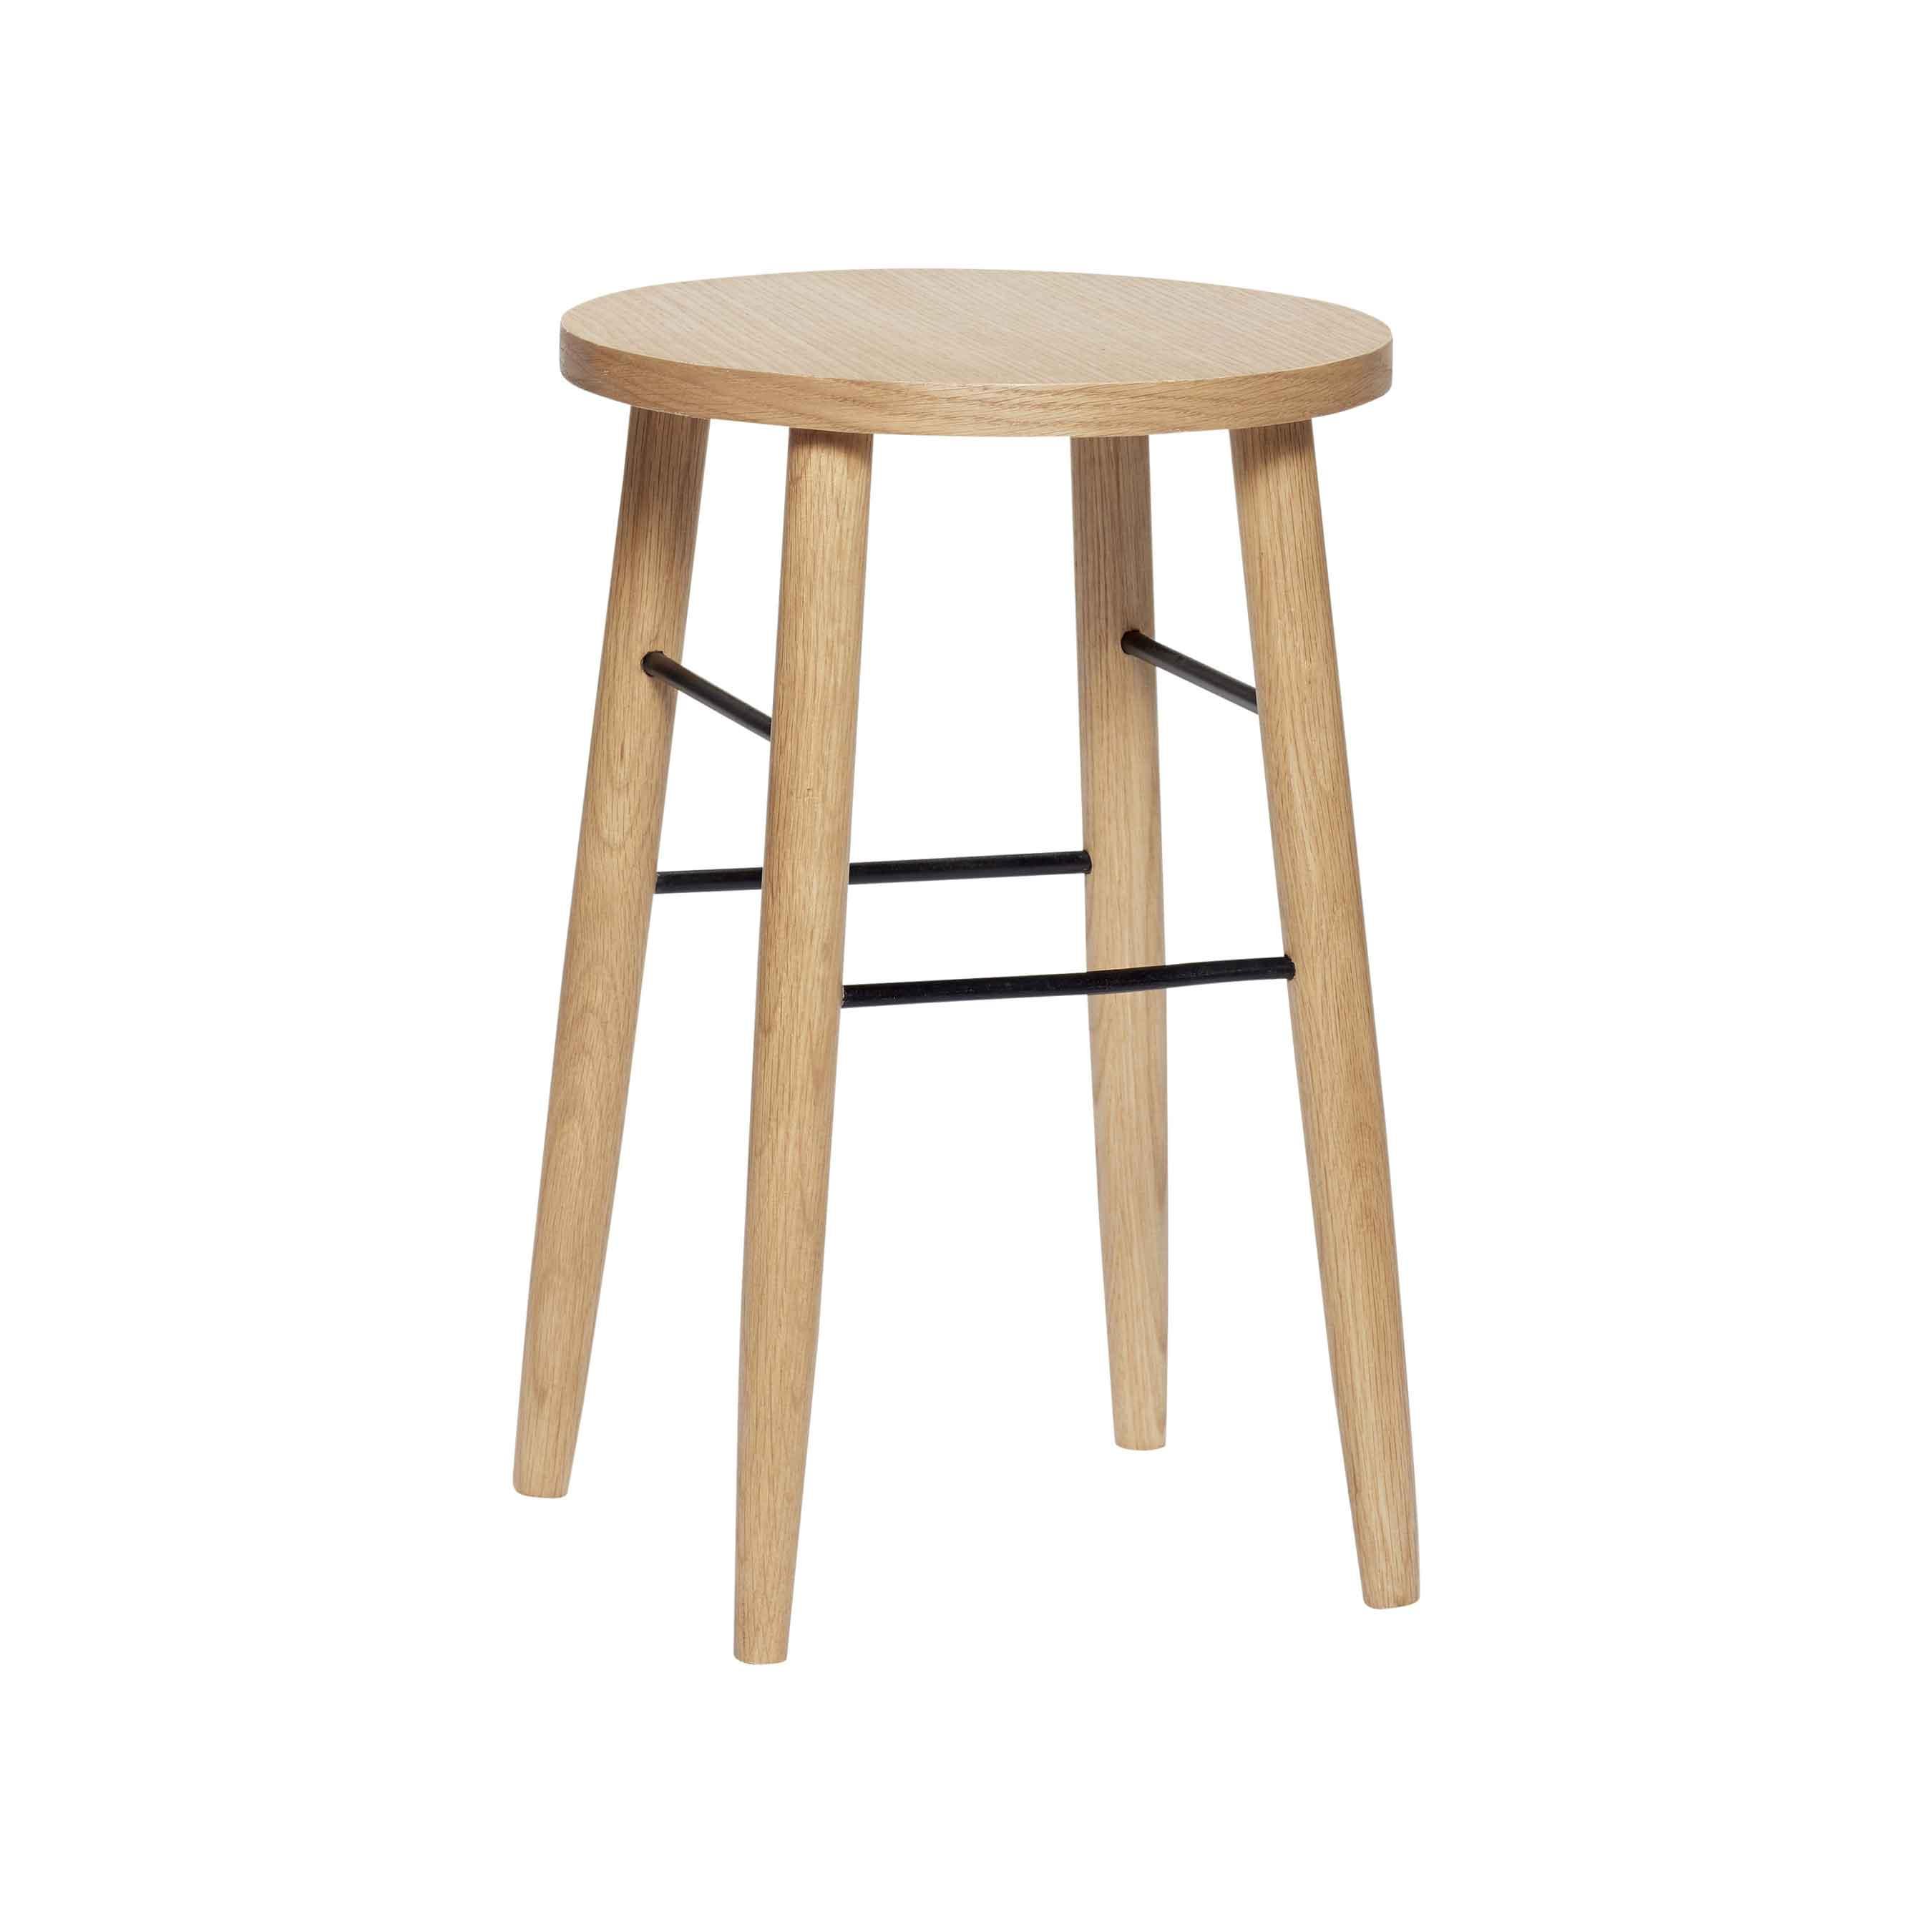 hübsch H?bsch barstol - egetræ/metal, natur/sort, rund (ø35) på boboonline.dk